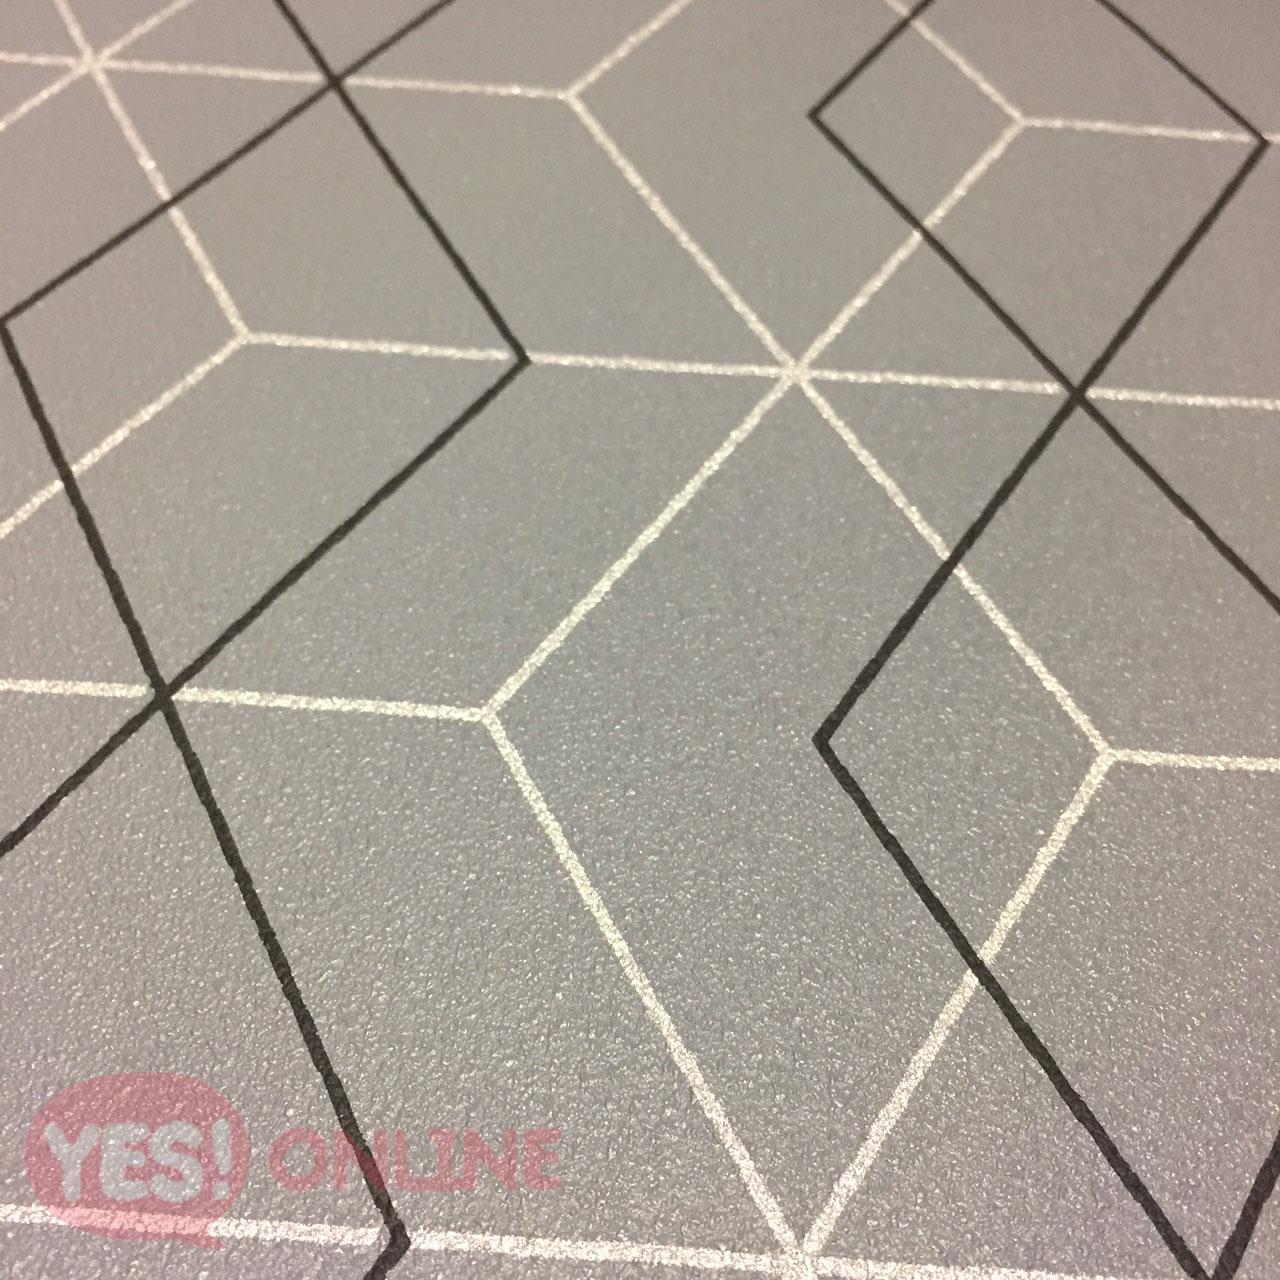 Metallic Geometric Modern Luxury Wallpaper Textured Vinyl Grey Black Silver